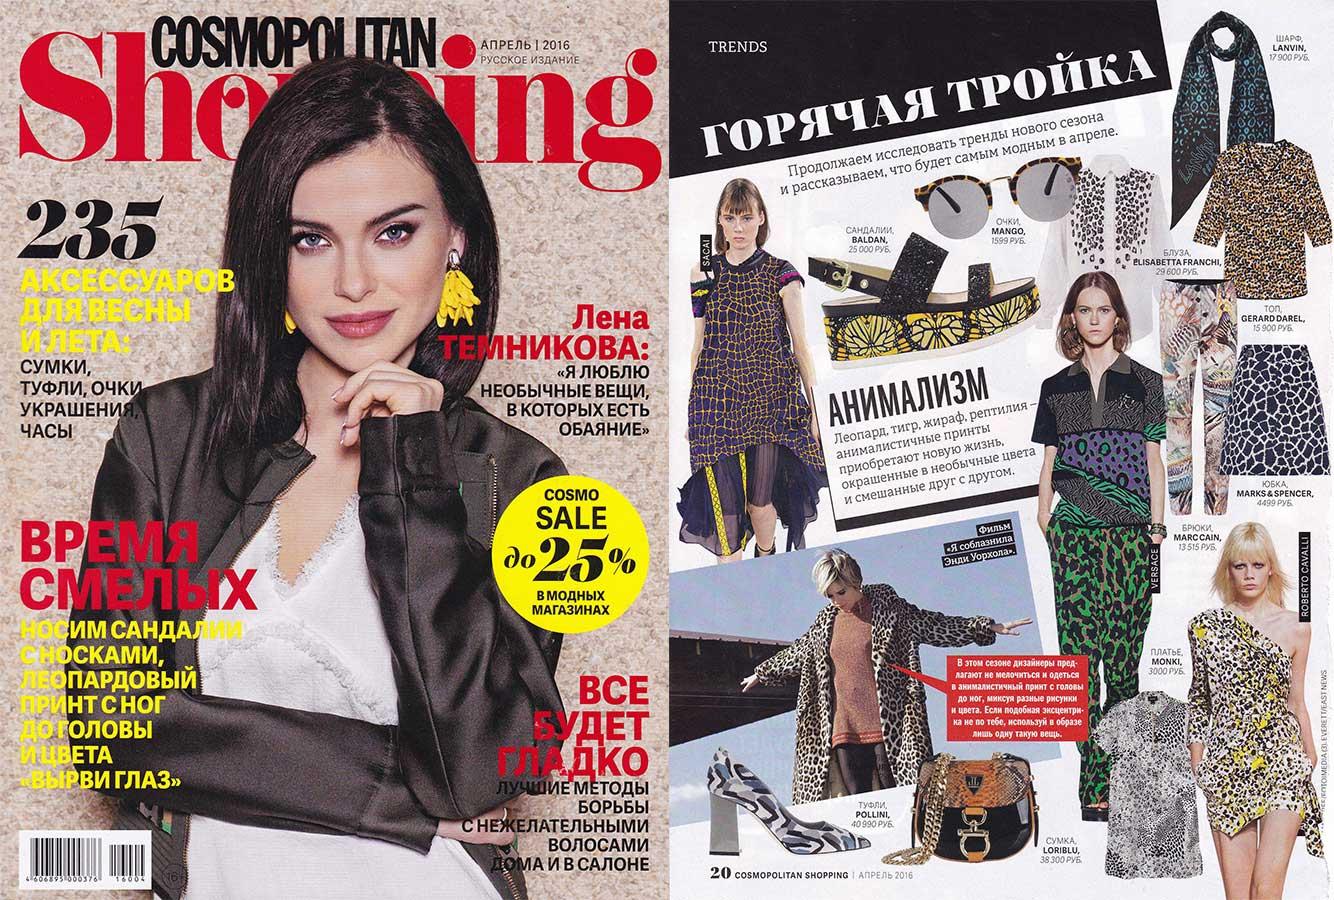 Cosmopolitan Апрель.jpg